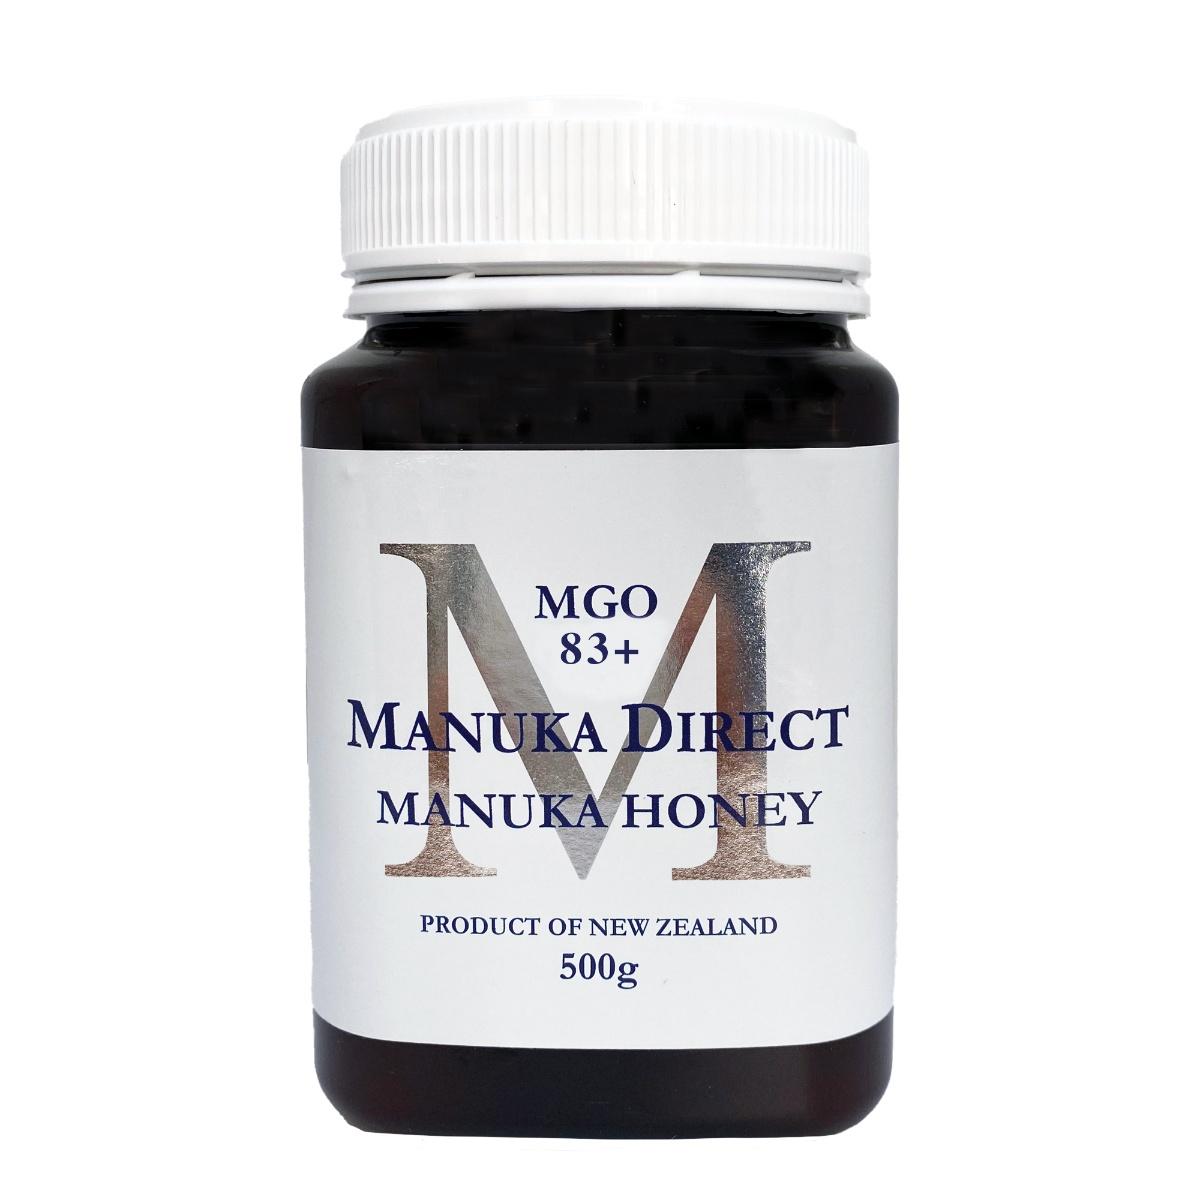 V3 Metalic M Cut Out - Manuka Direct MGO 83+ 500g